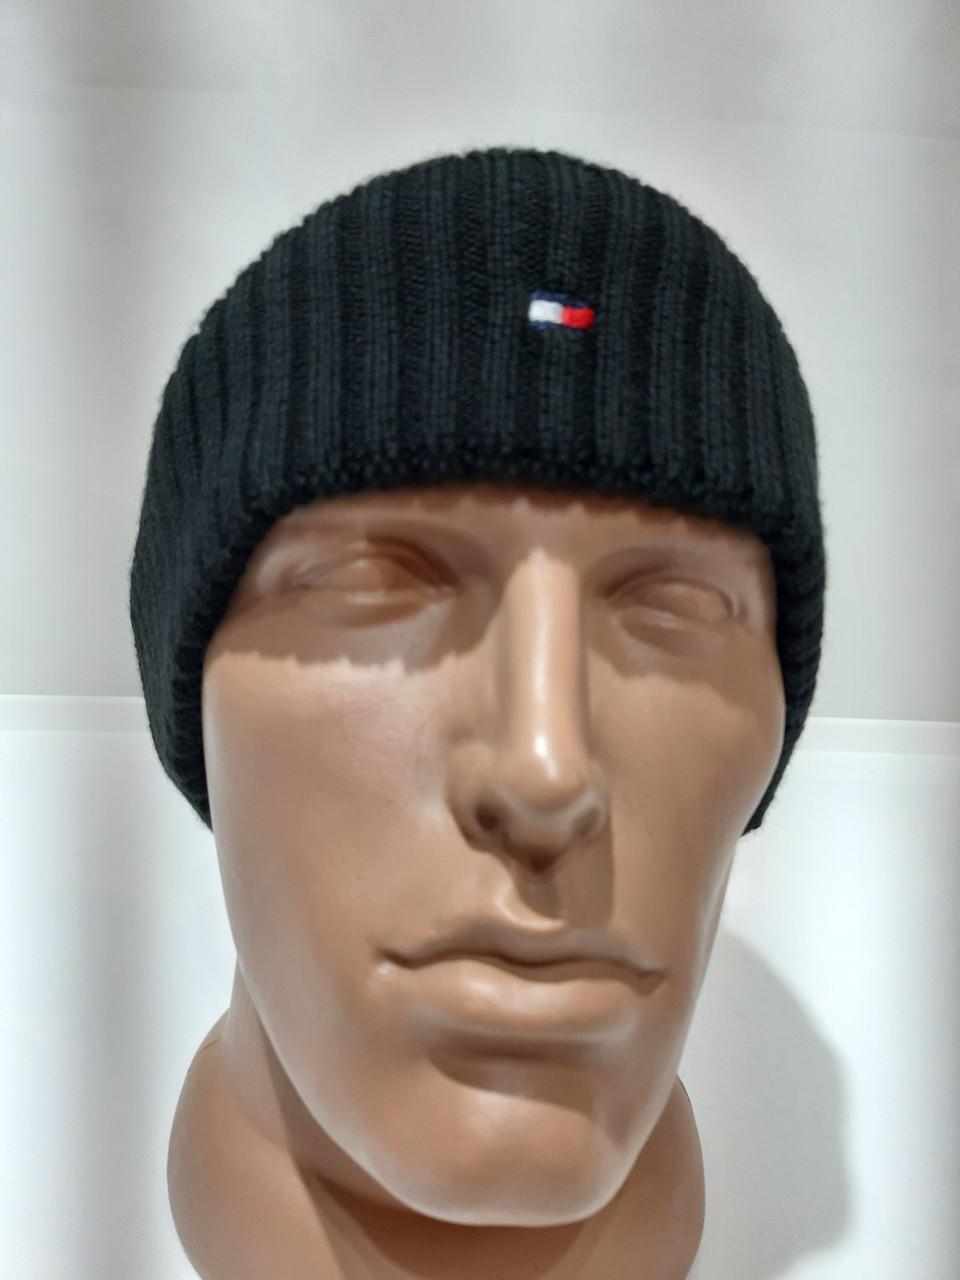 Теплая вязаная мужская шерстяная зимняя шапка с отворотом черная Турция